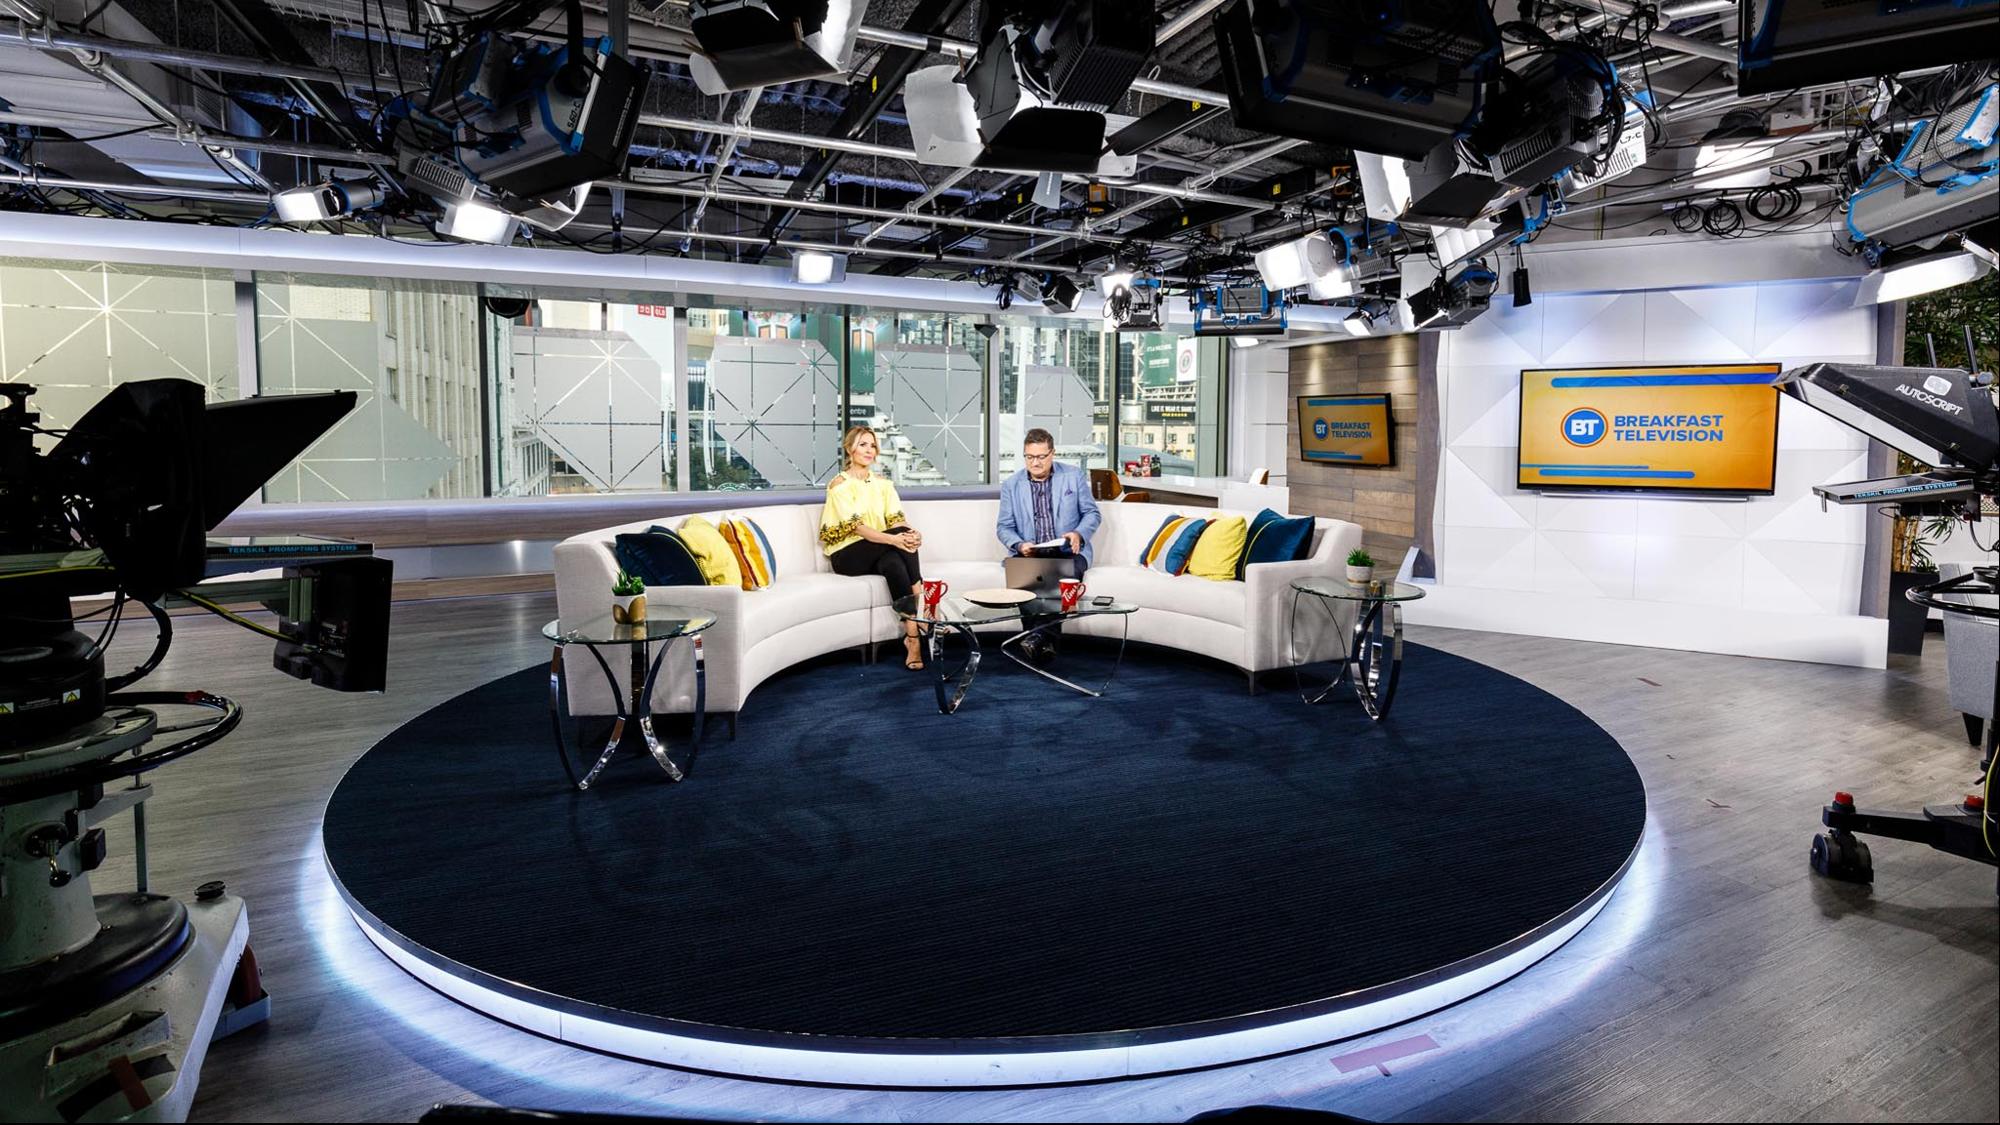 ncs_bt-breakfast-television-canada-tv-studio_0002